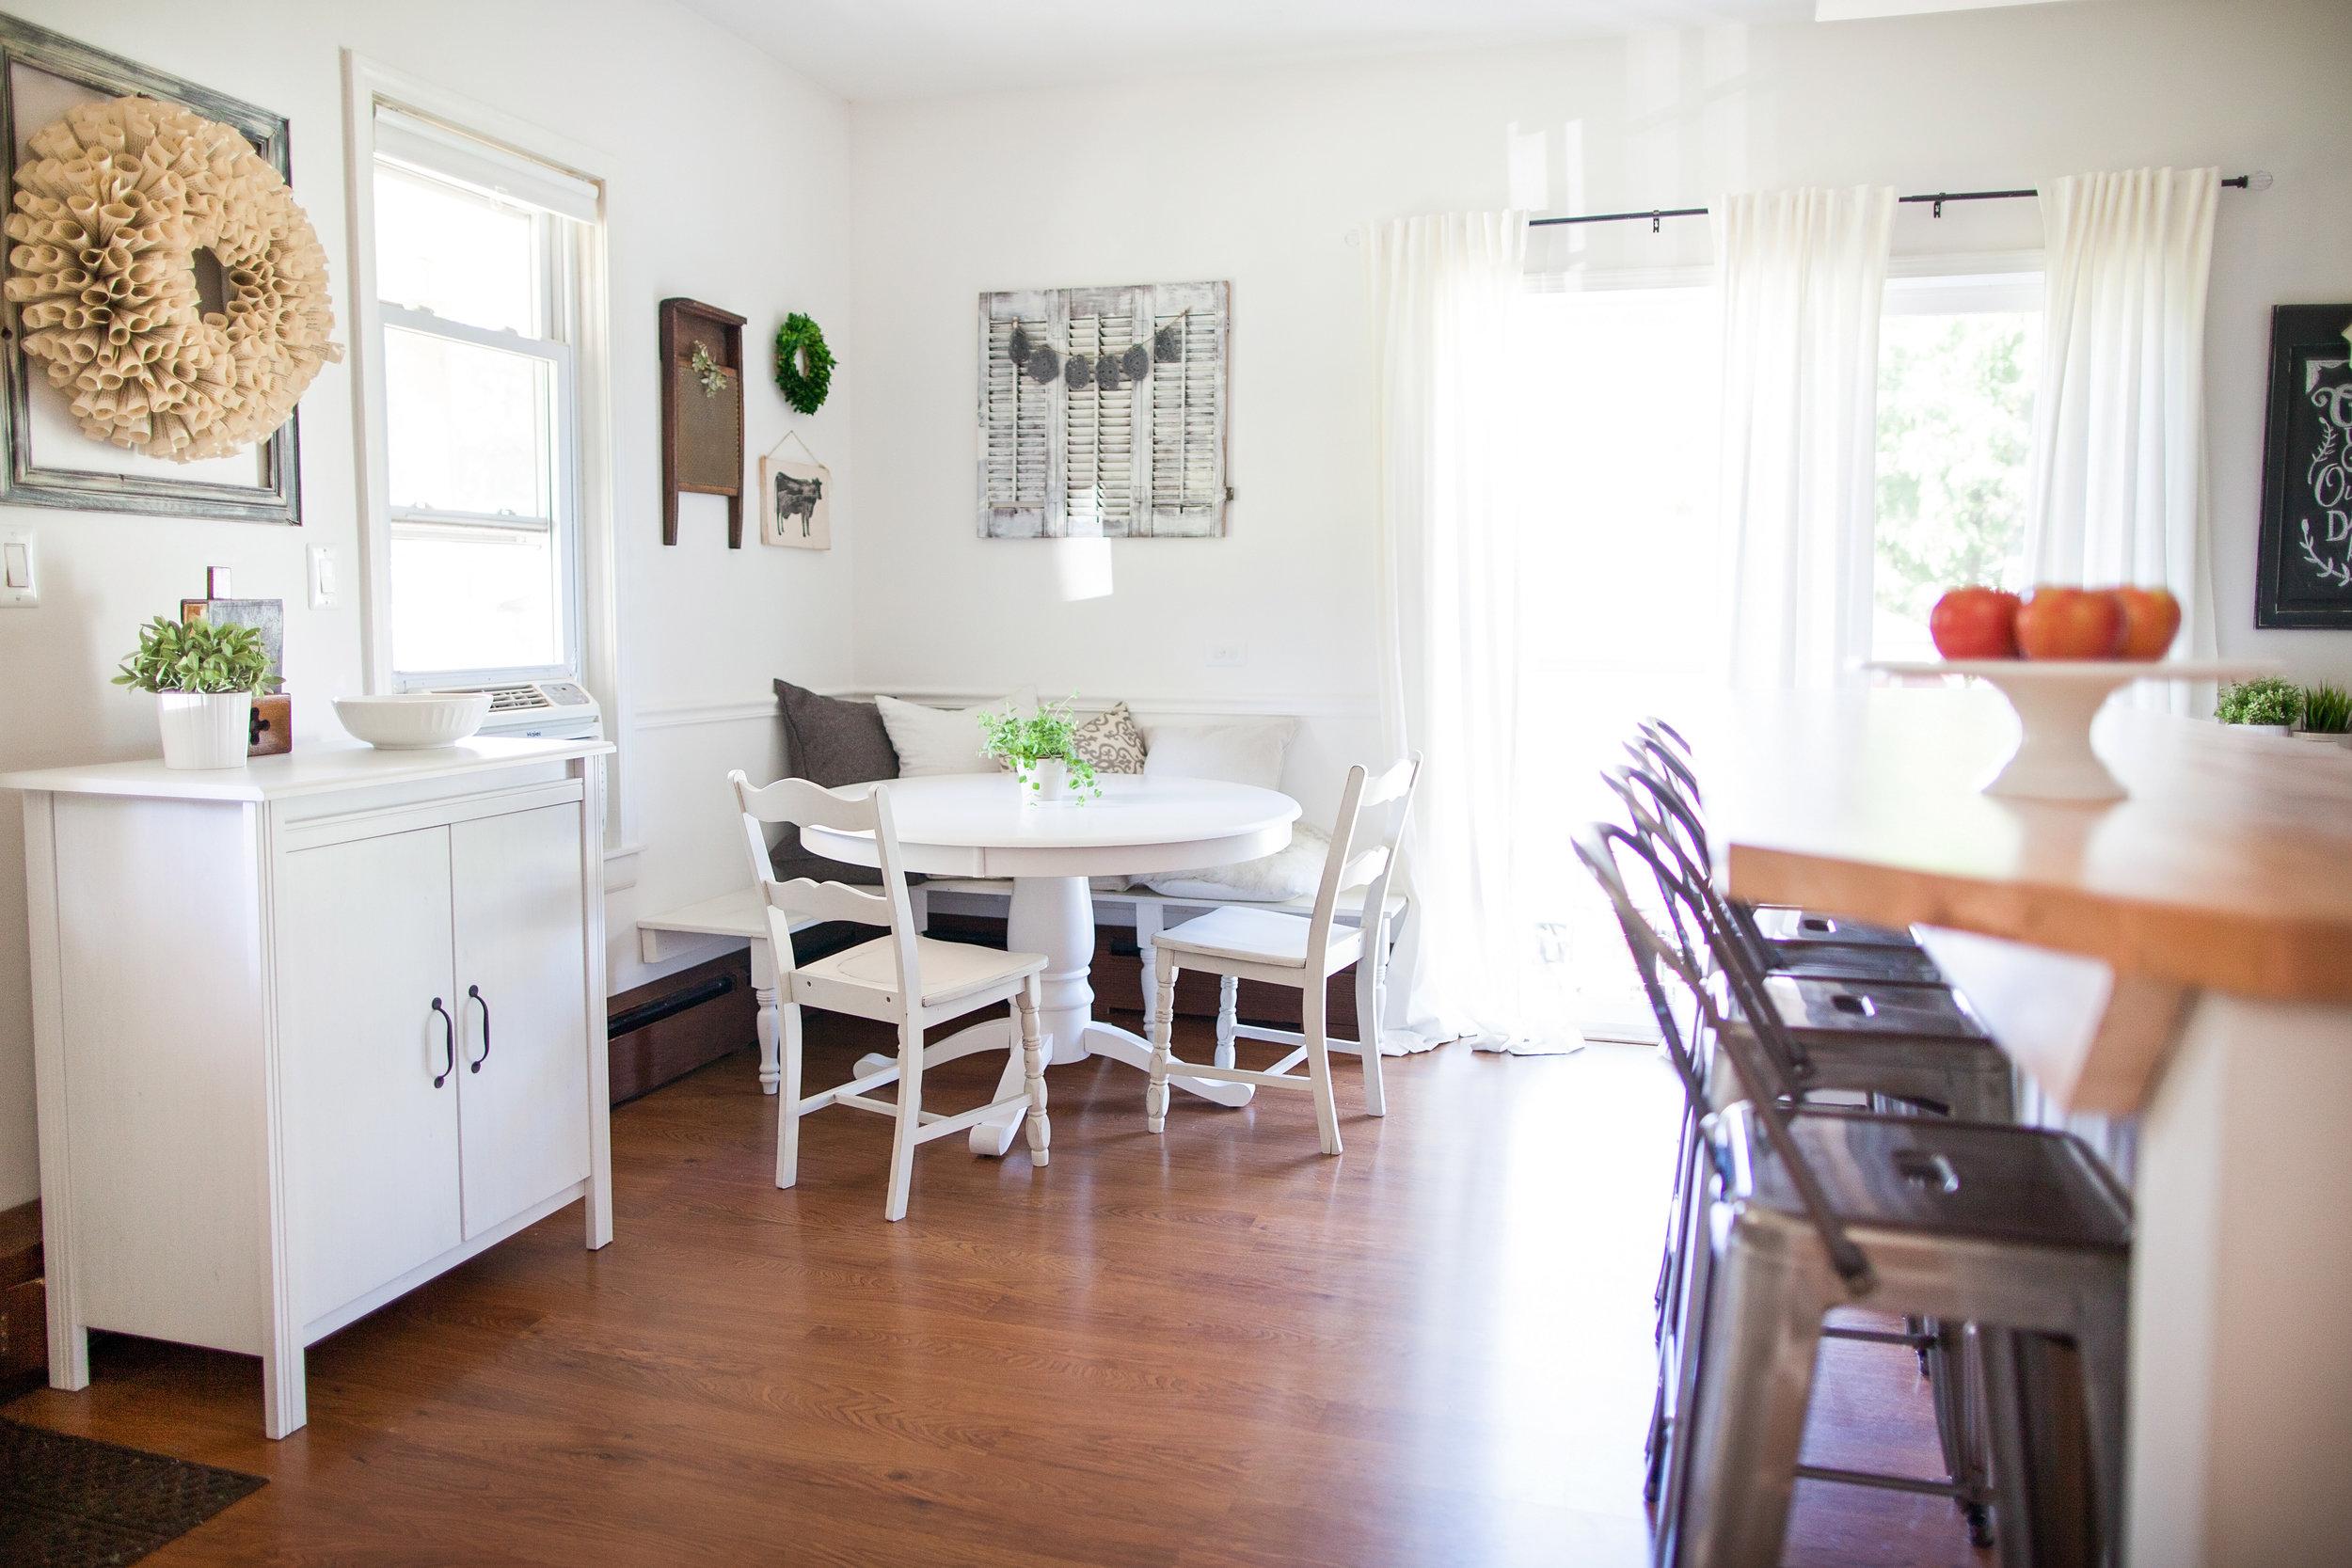 Farmhouse Kitchen Makeover- Laura Design Co.